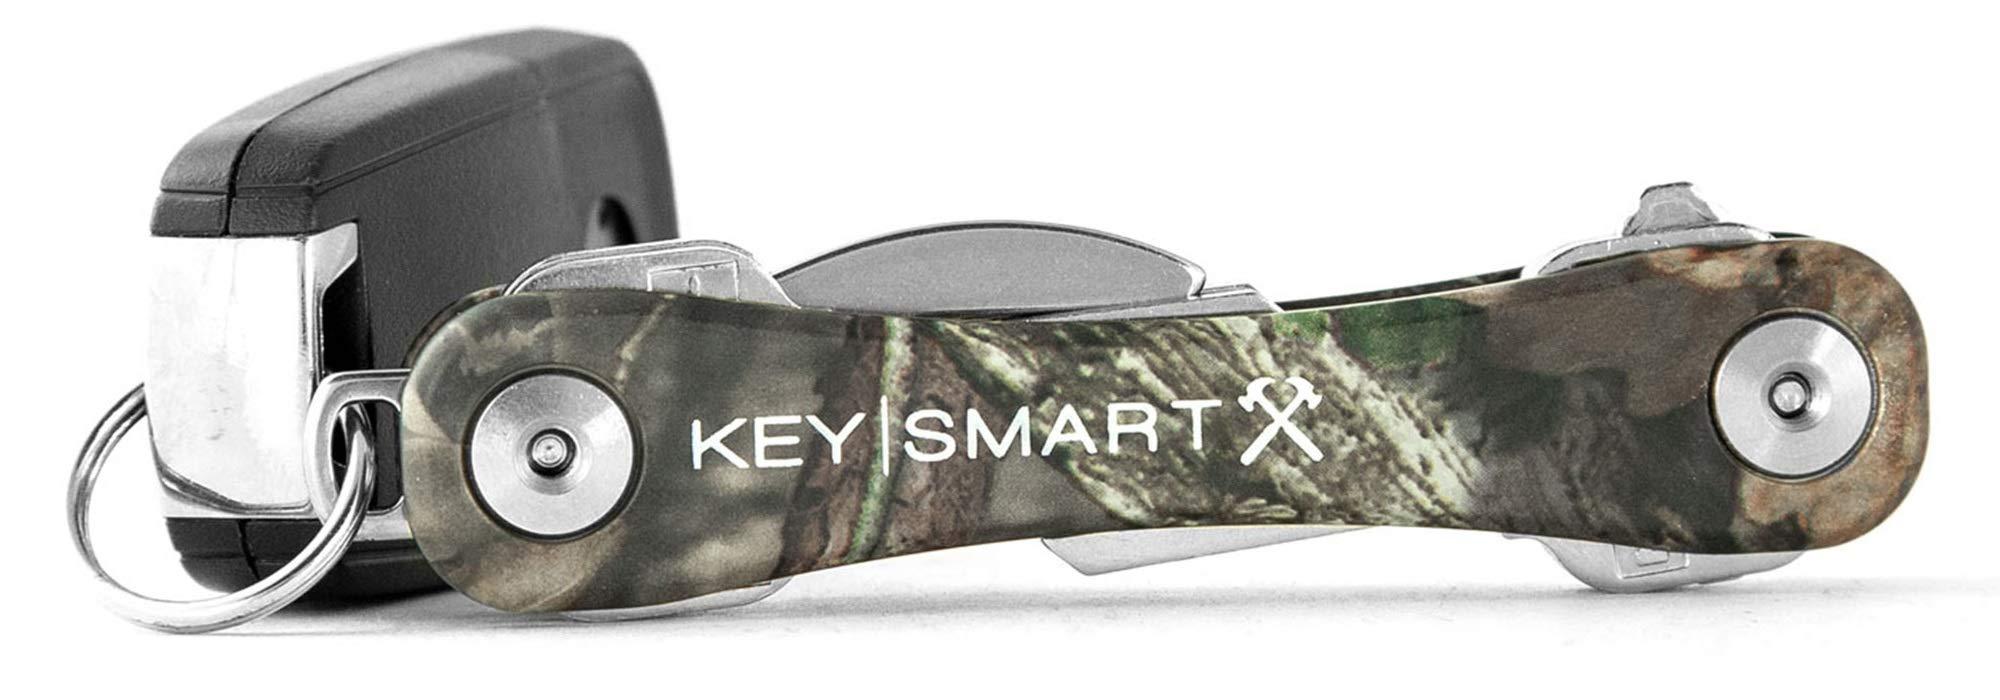 KeySmart Rugged - Multi-Tool Key Holder w Belt Clip & Bottle Opener (up to 14 Keys)